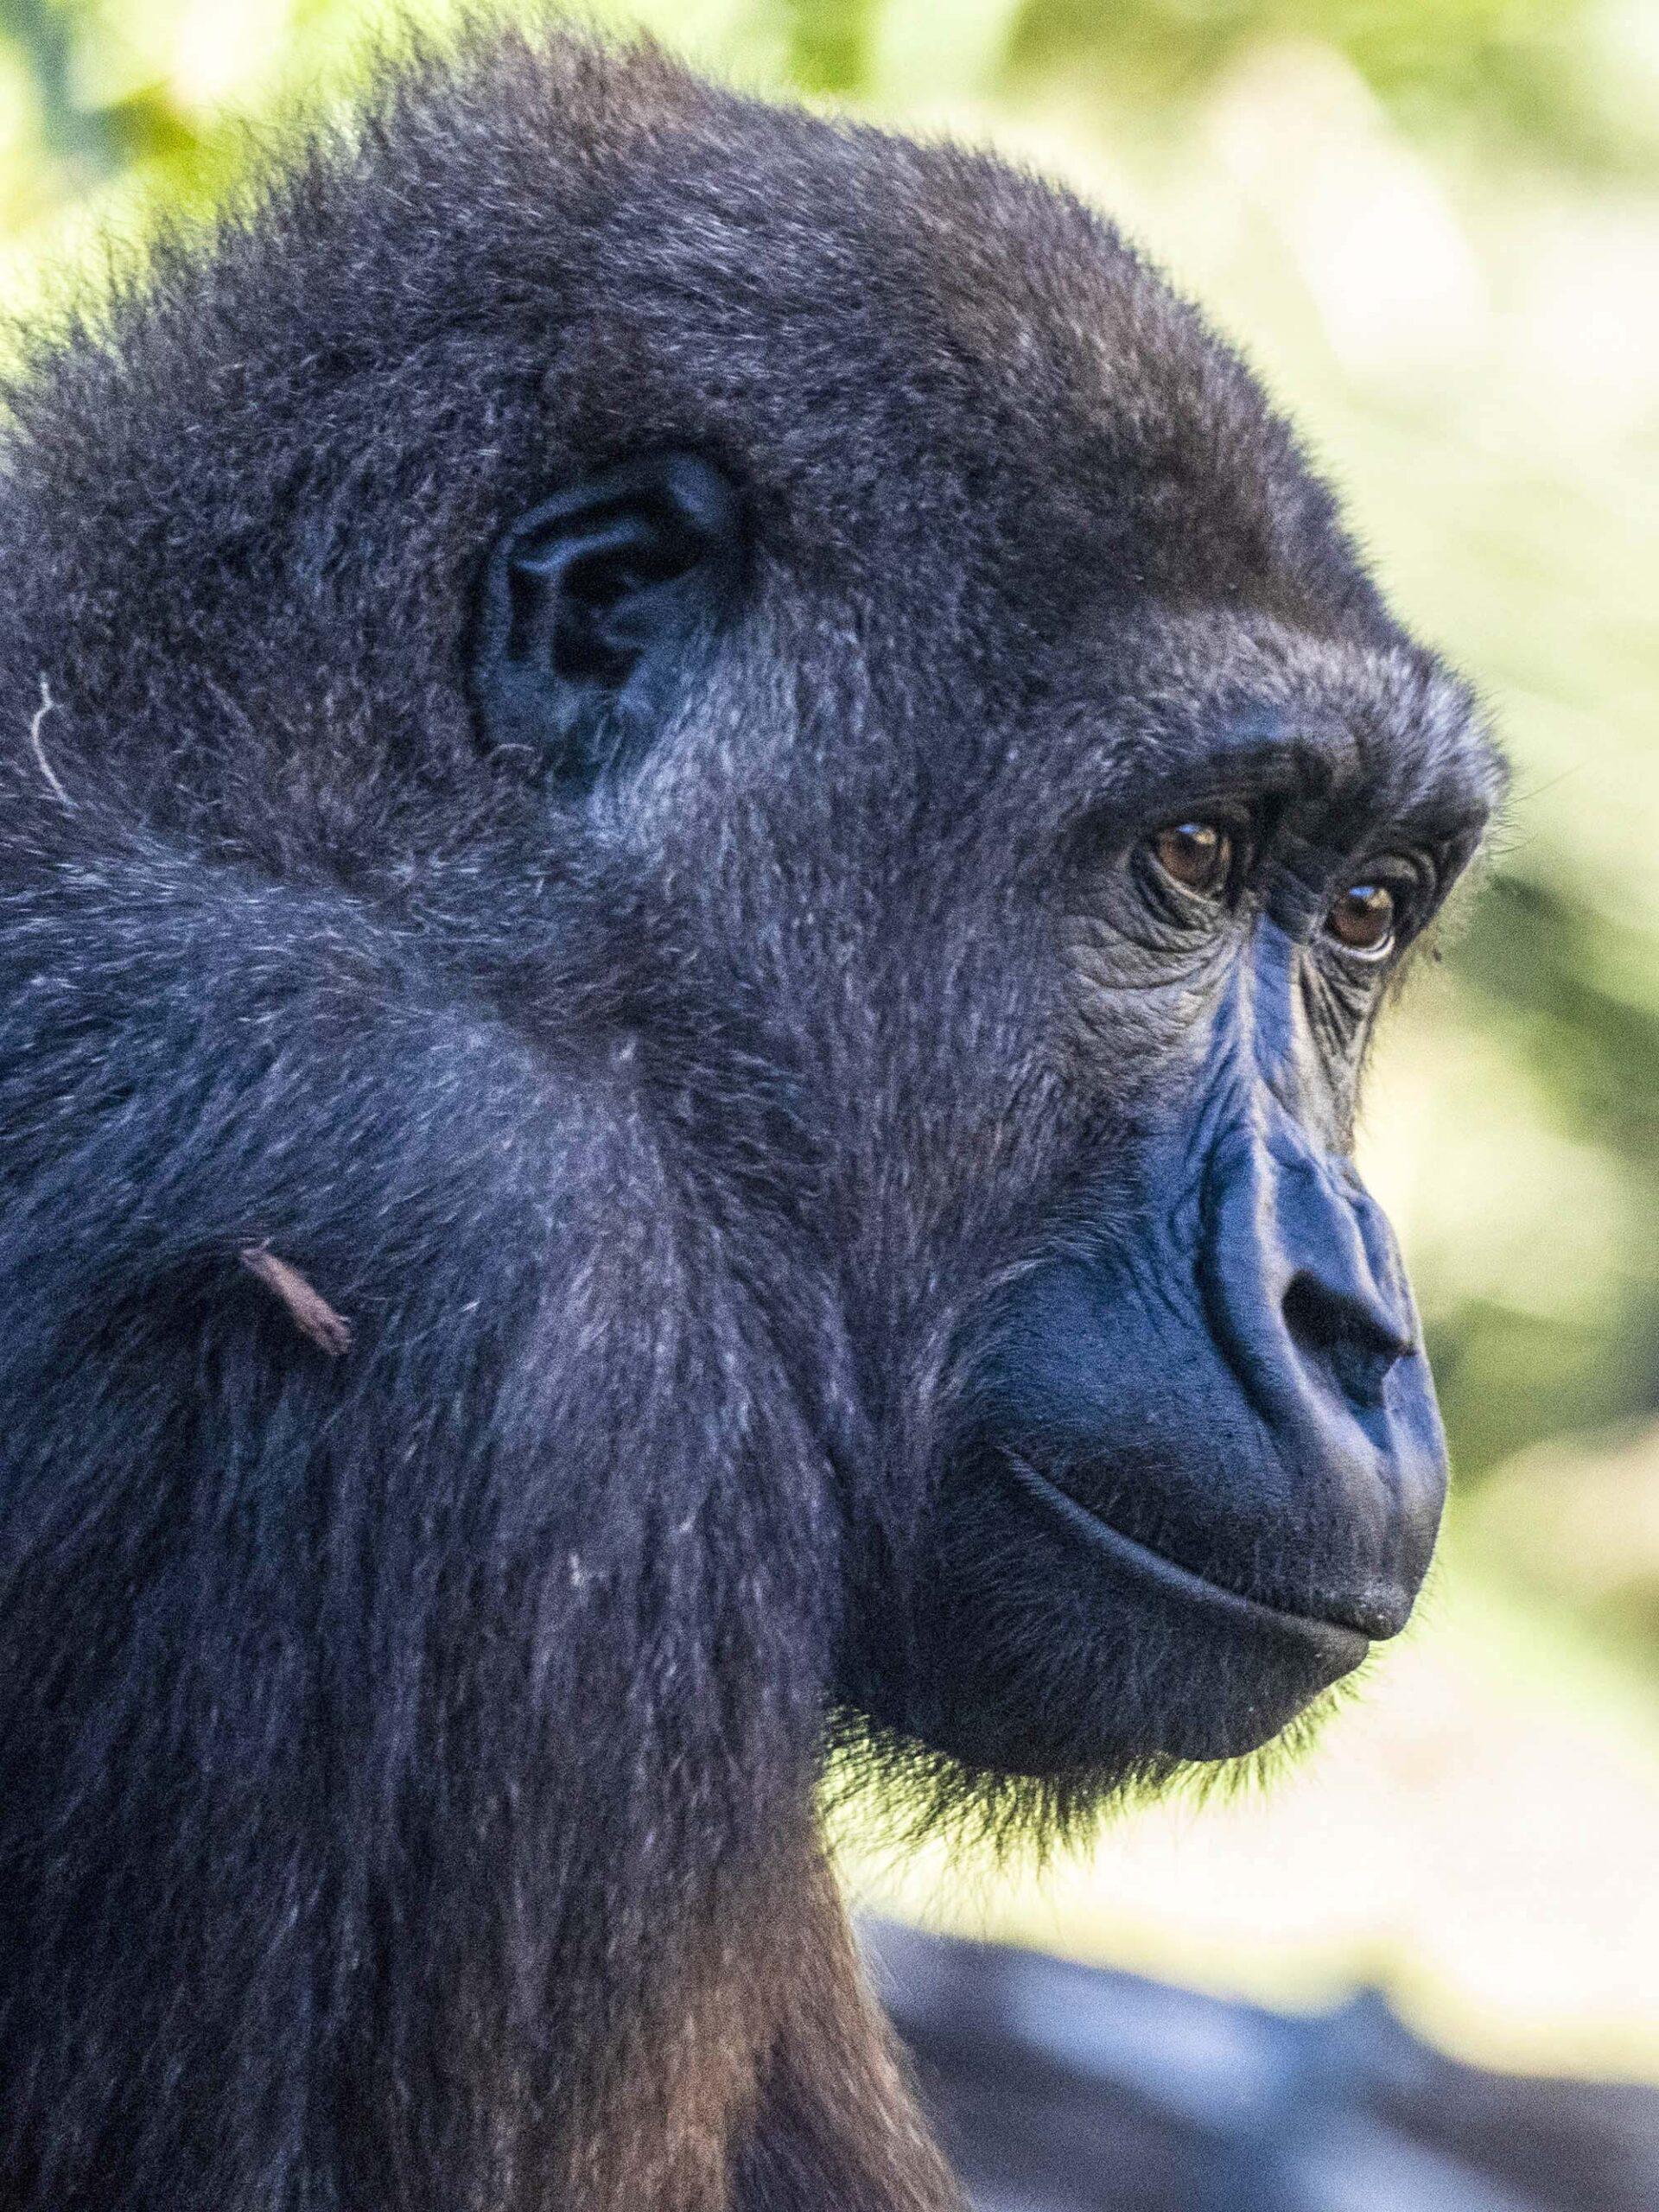 Spain, Cameroon Coordinate Efforts To Save Endangered Gorillas